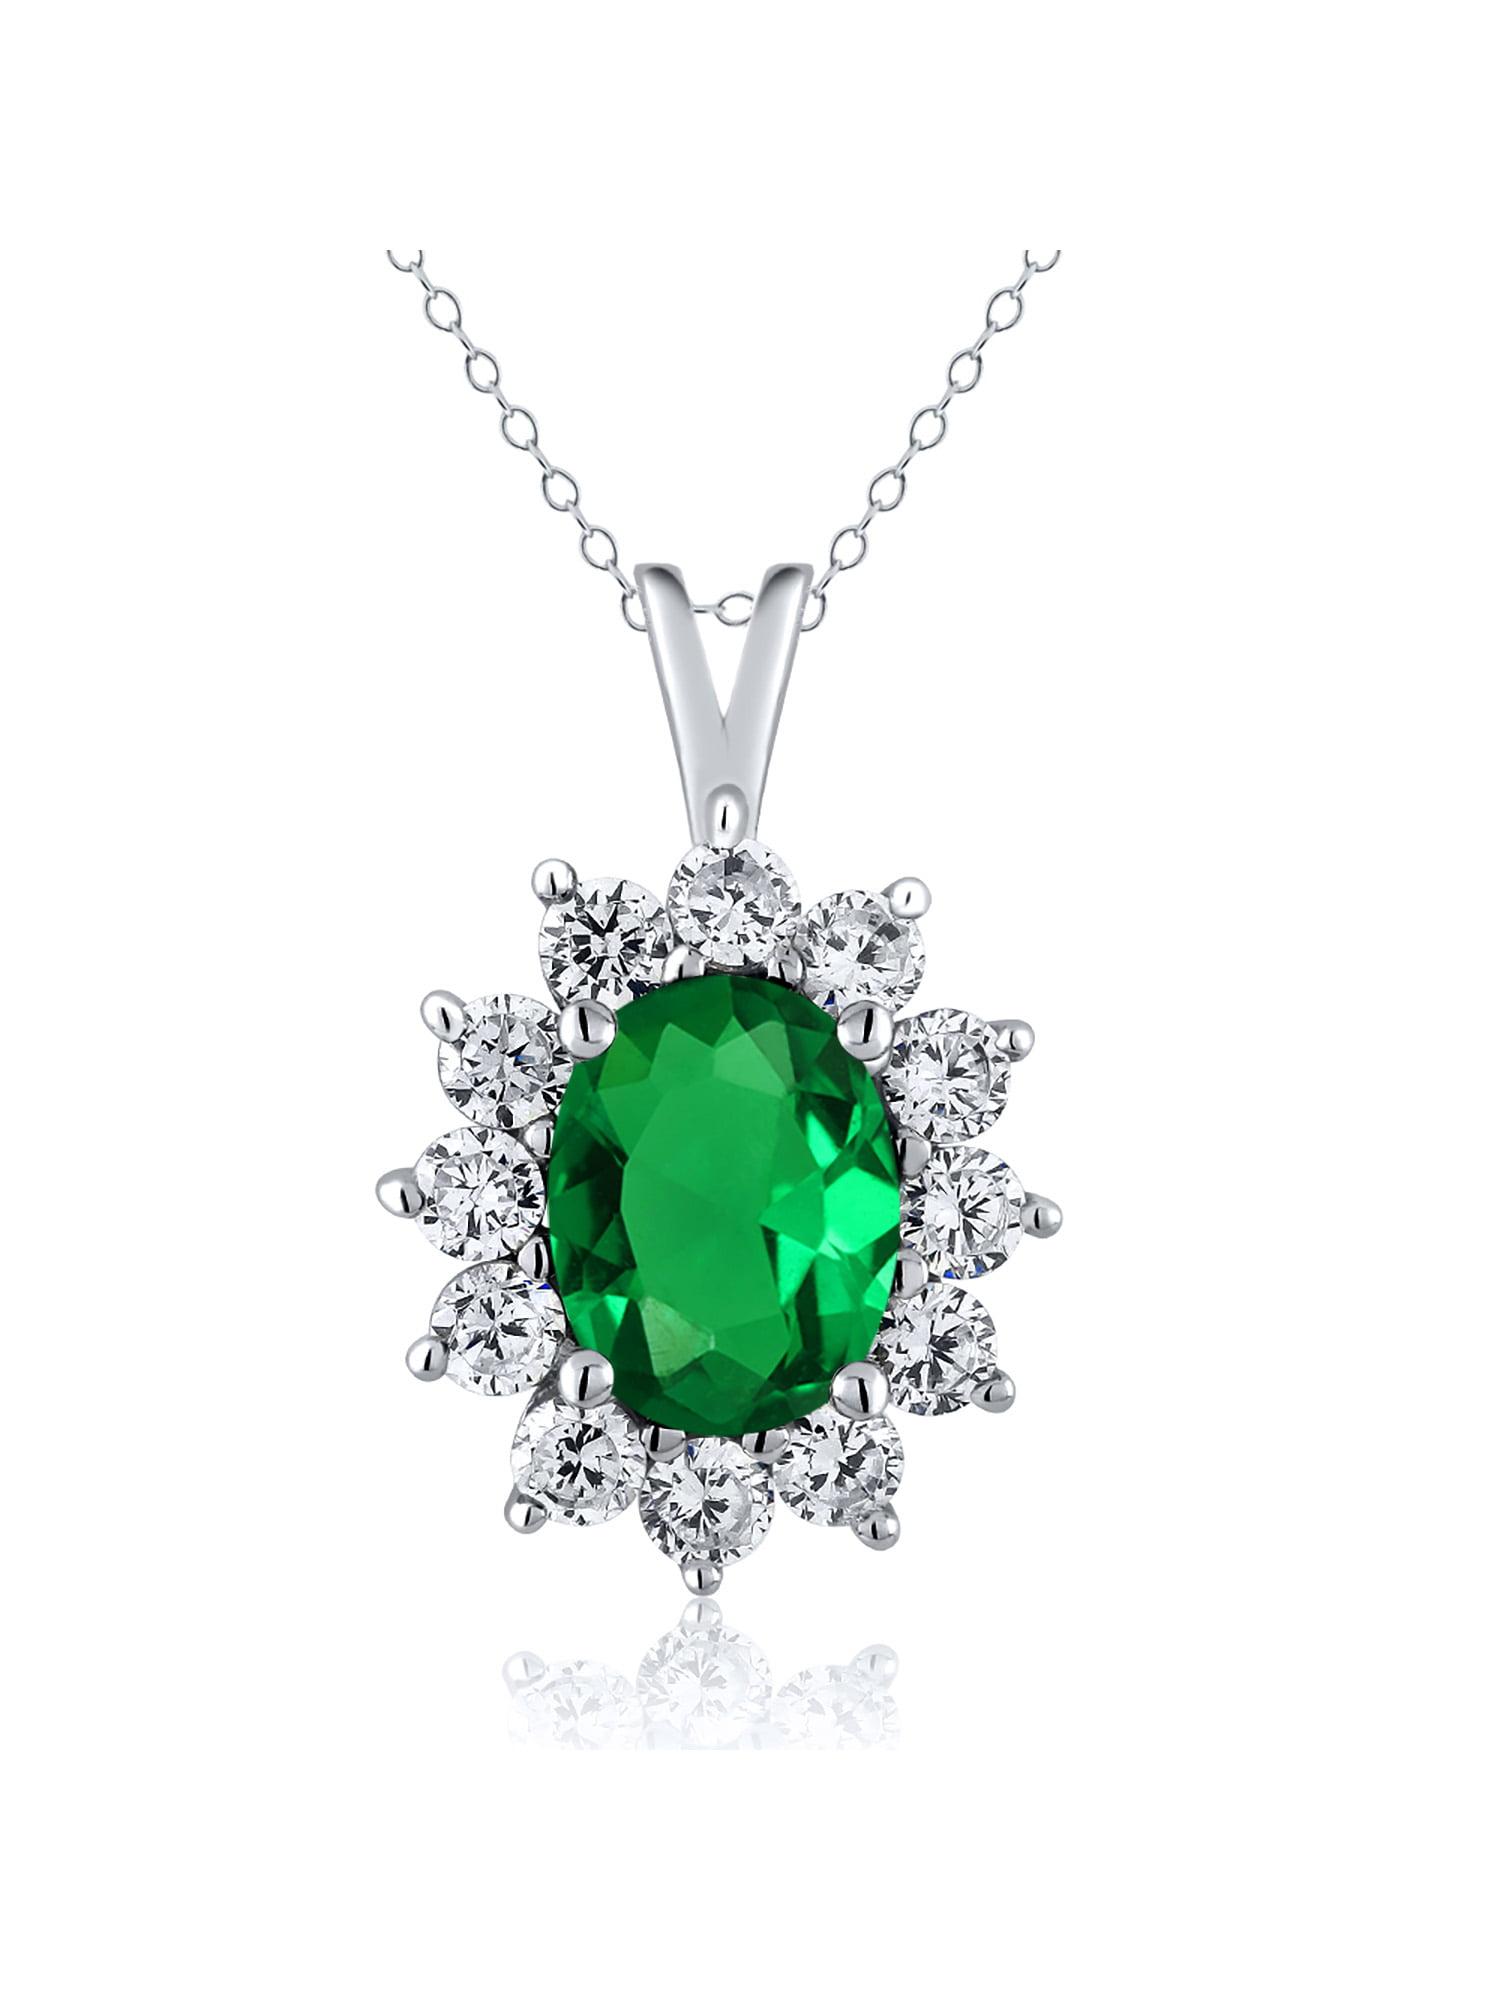 Princess Kylie Rhodium Plated Sterling Silver Horizontal Design Diamond Cut Bead 025 Chain 2.5mm